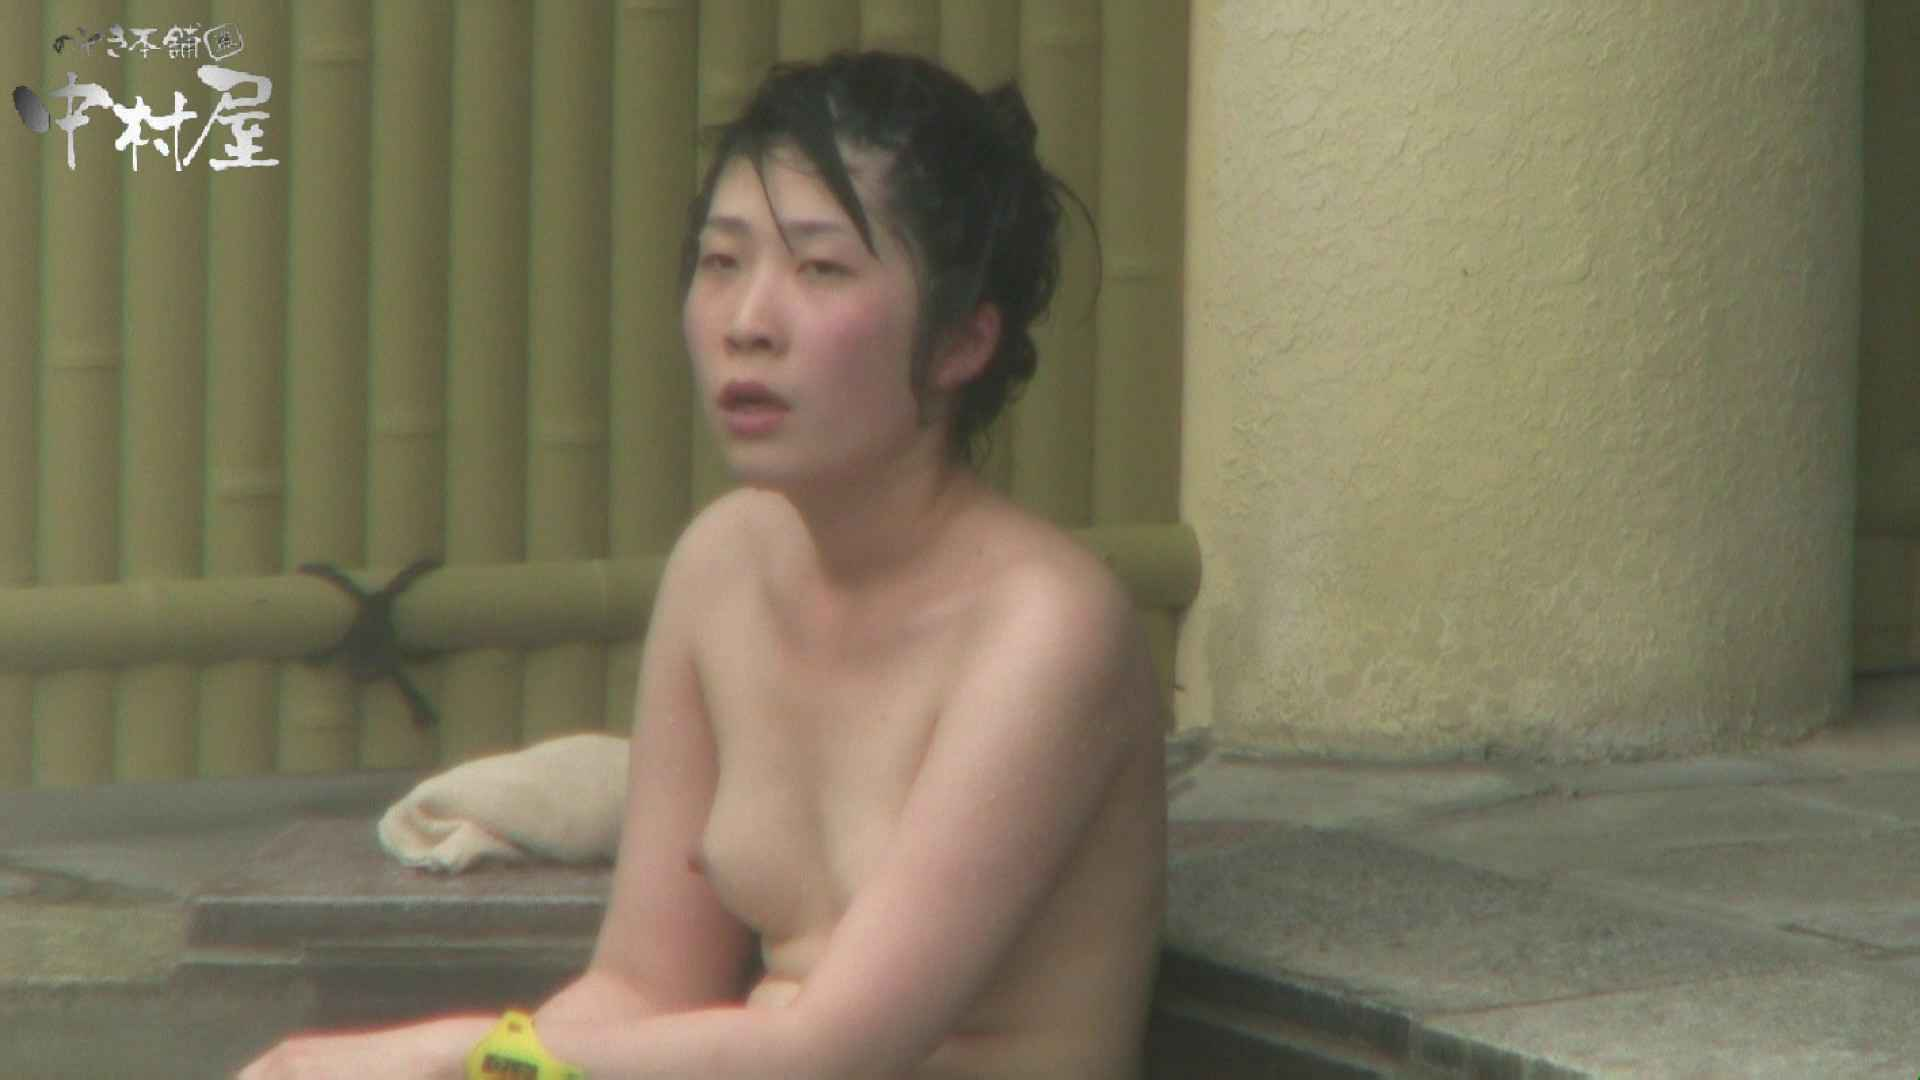 Aquaな露天風呂Vol.955 盗撮師作品  85pic 36